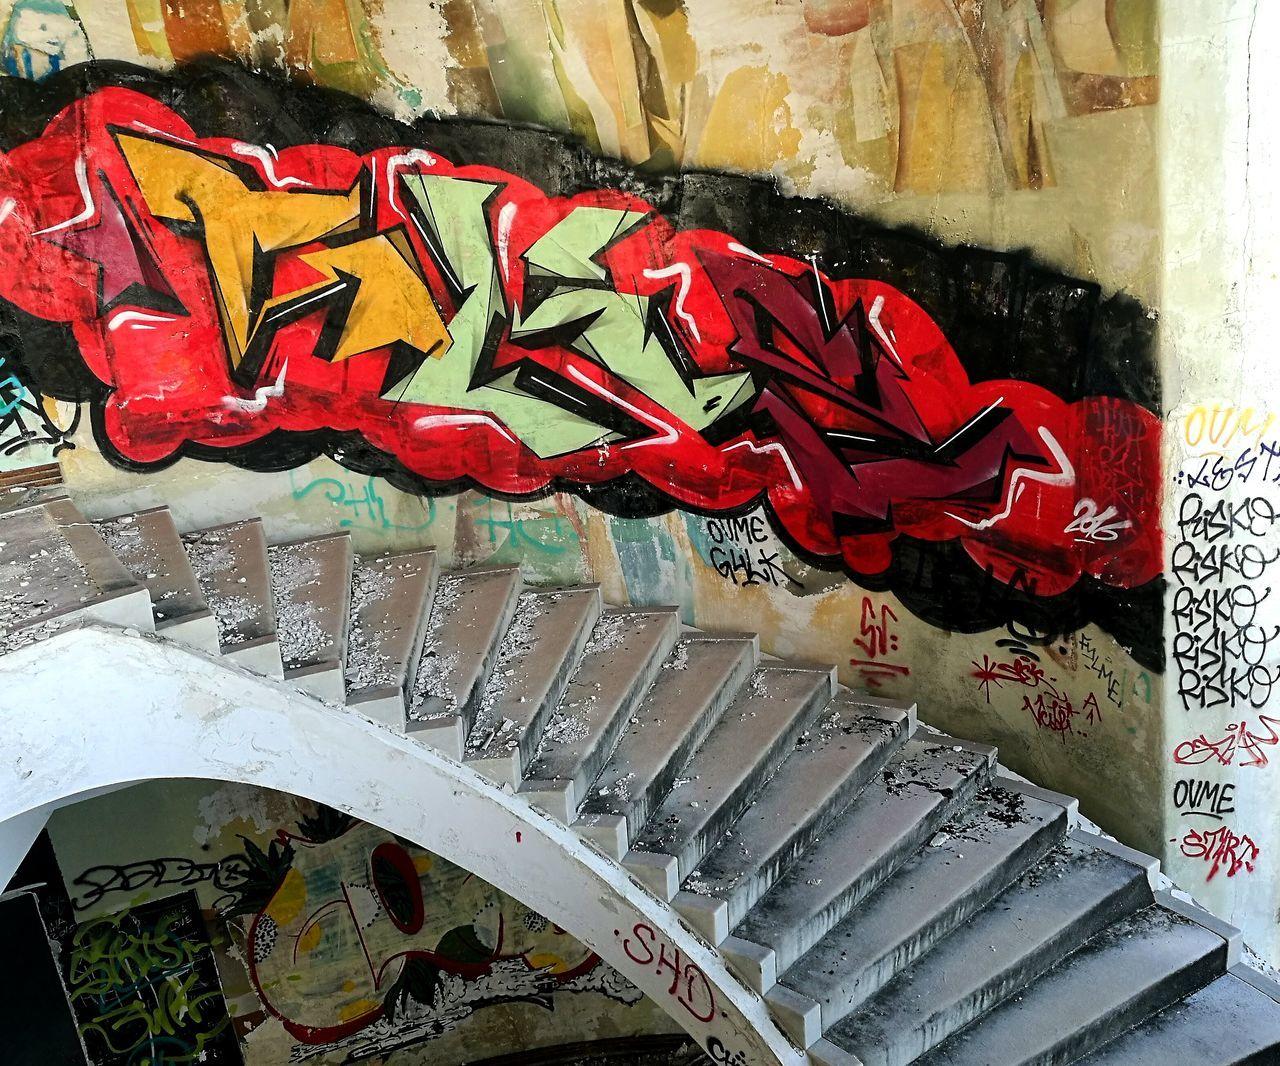 No People Outdoors Monsanto Lisboa Built Structure Streetphotography Morning Run Graffiti The World Grafitti